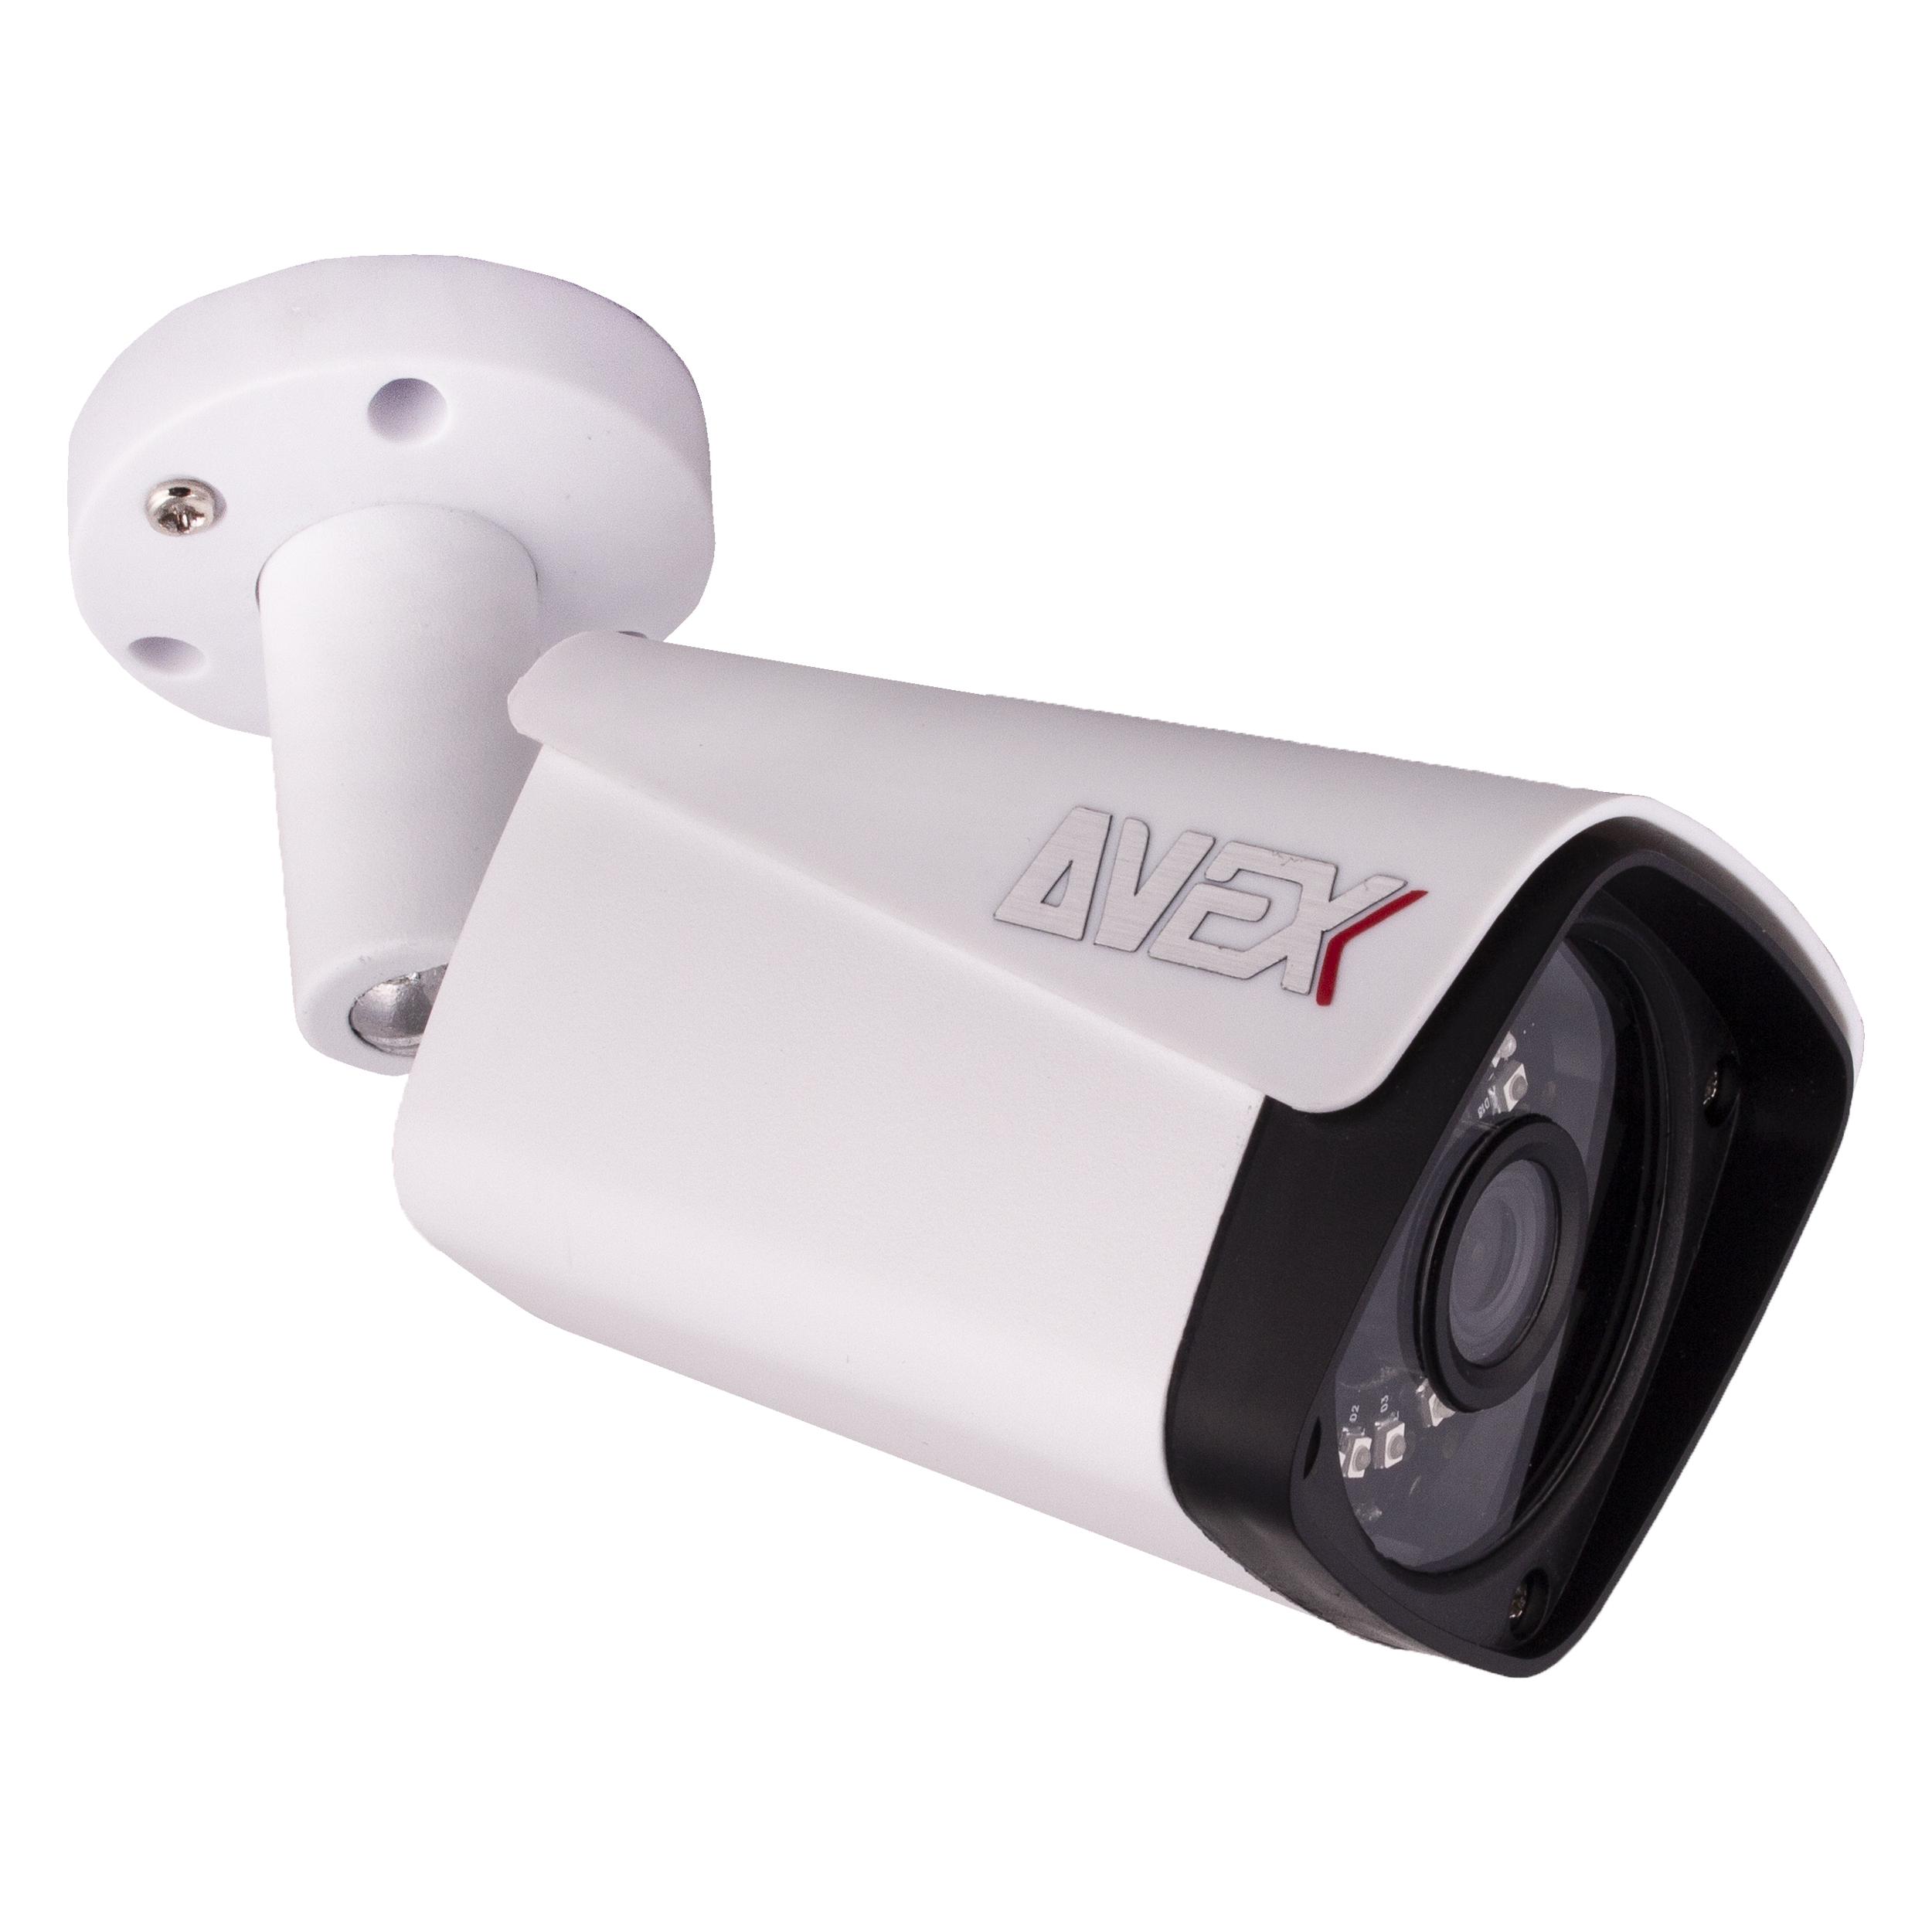 خرید اینترنتی                     دوربین مداربسته آنالوگ اوکث مدل AV-270HDX